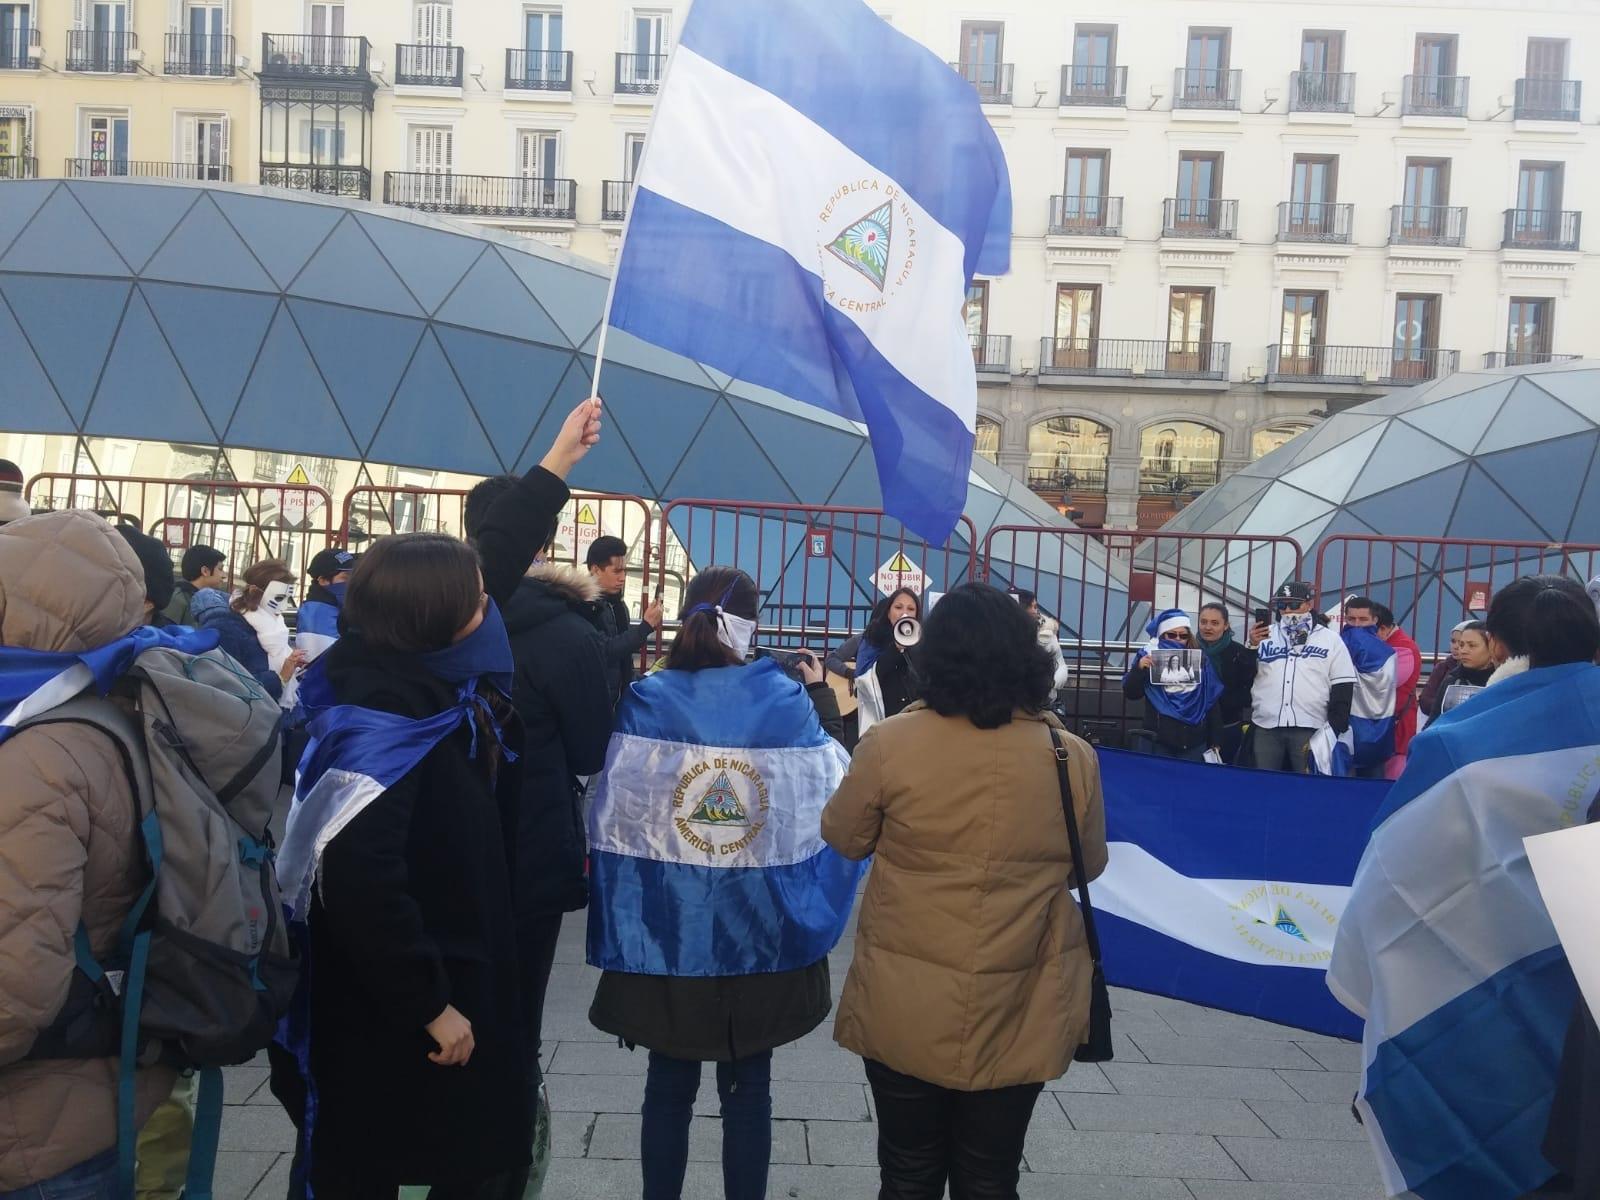 Nicaragüenses en Madrid boicotean concierto promovido por el régimen de Daniel Ortega. Foto ilustrativa/SOS Nicaragua Madrid